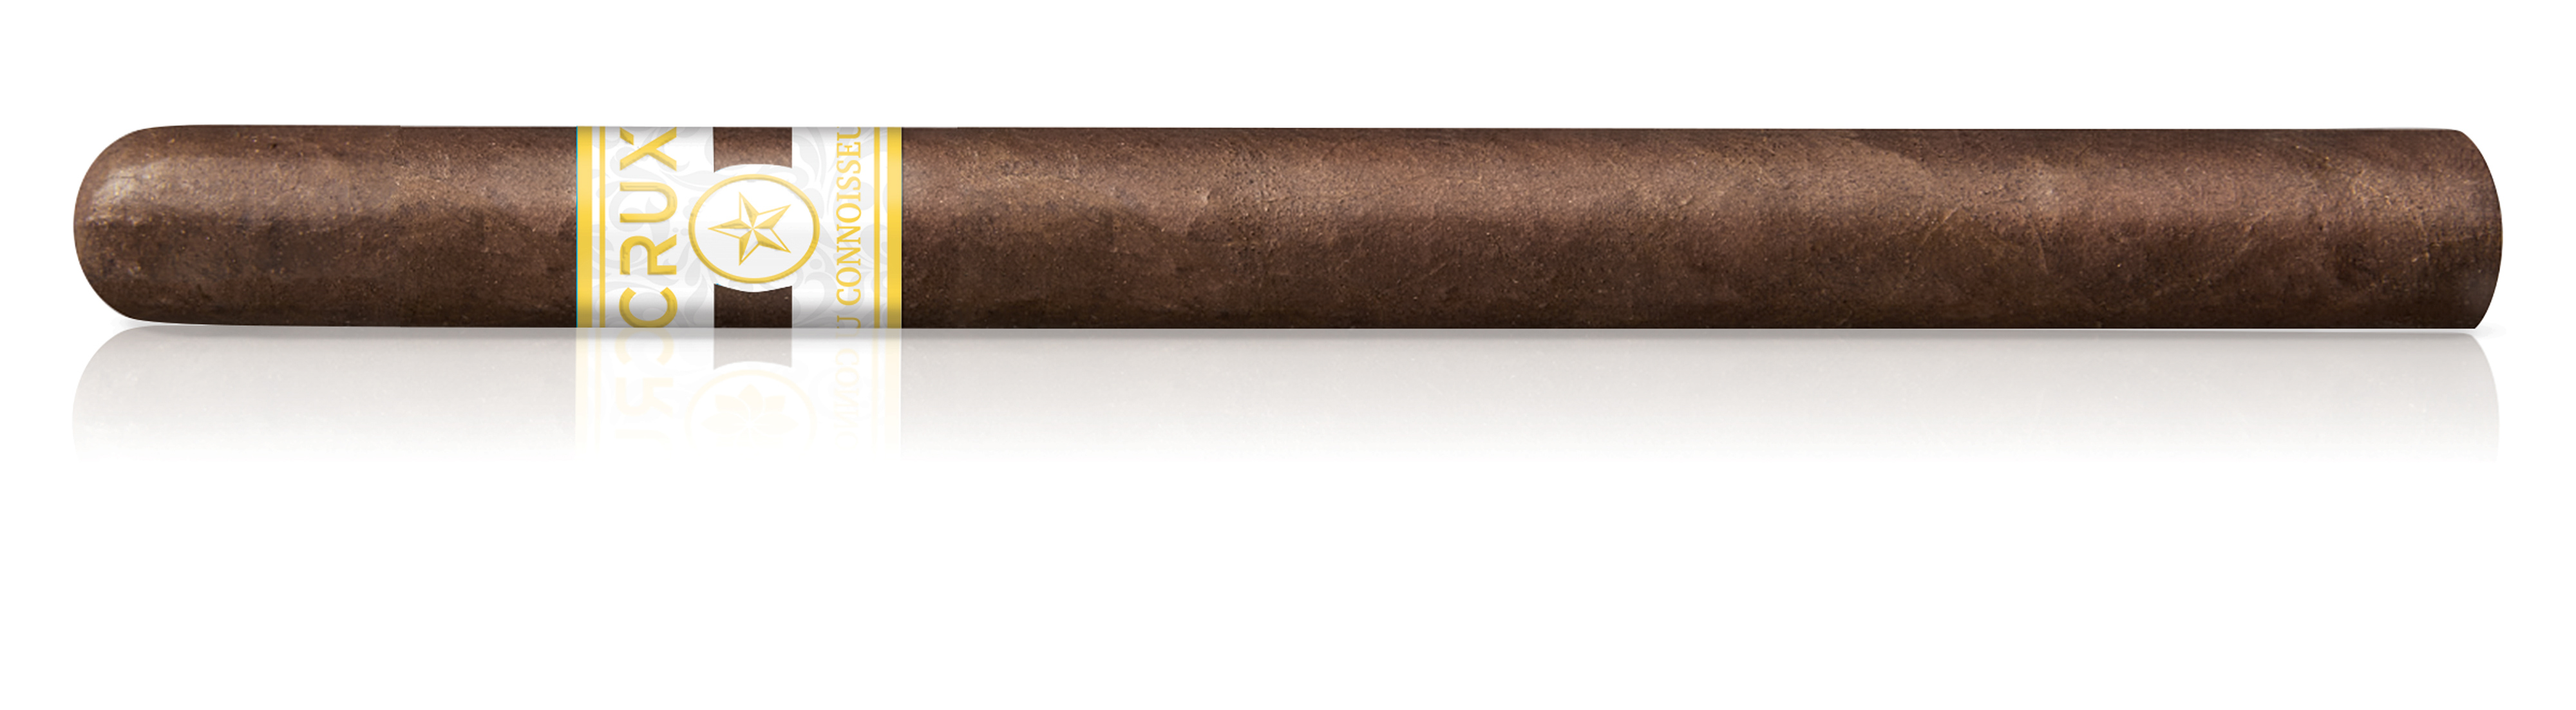 horizontal crux DuConnoisseur cigar